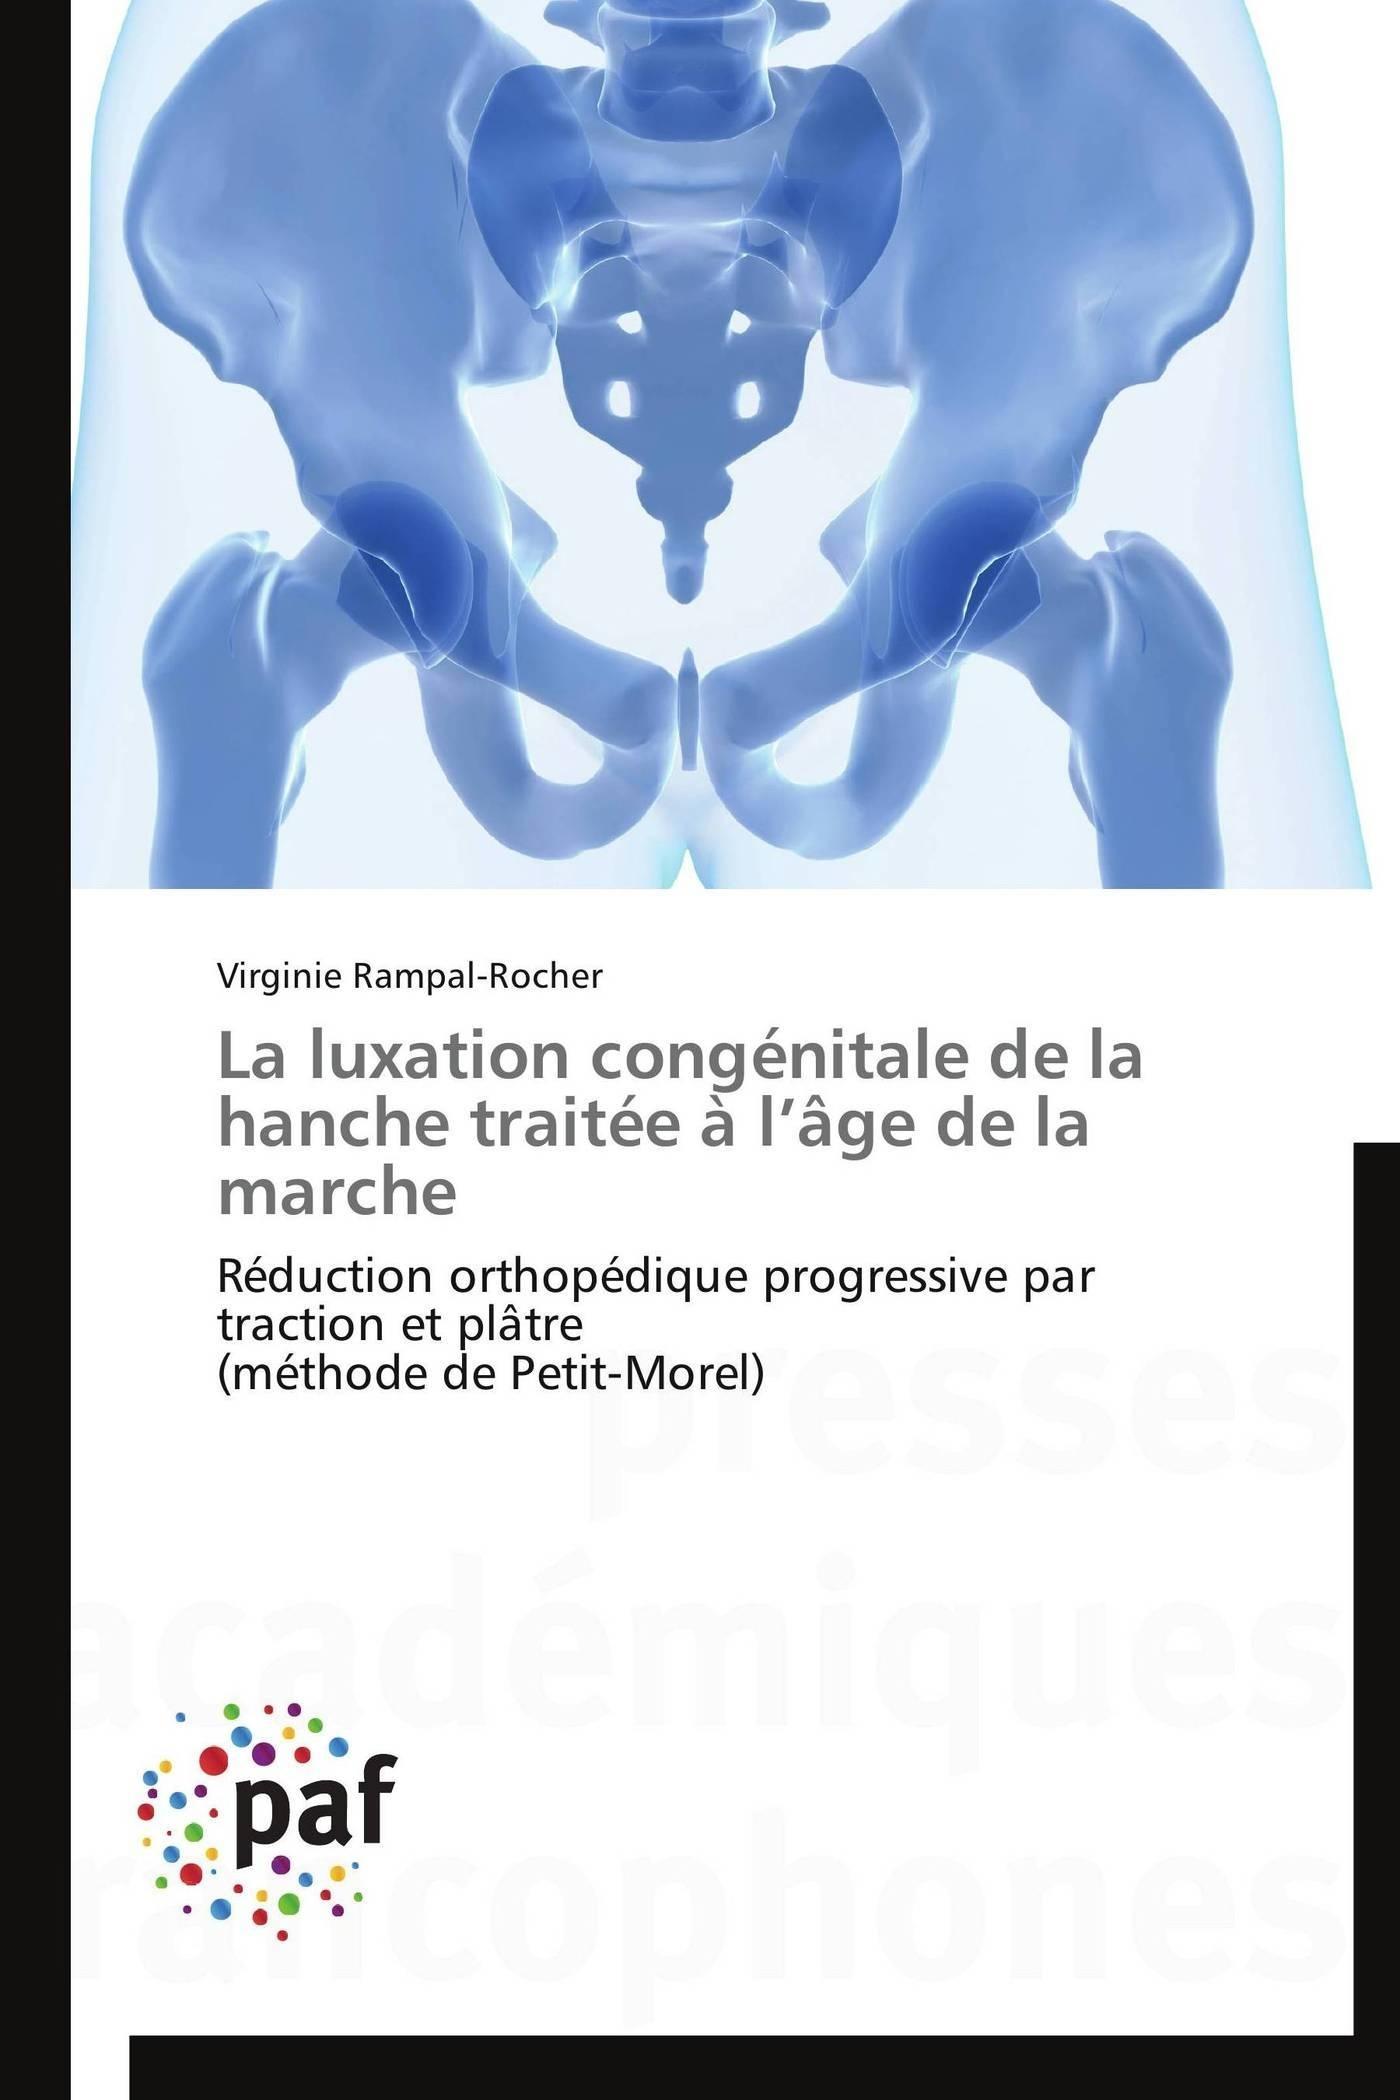 LA LUXATION CONGENITALE DE LA HANCHE TRAITEE A  L AGE DE LA MARCHE